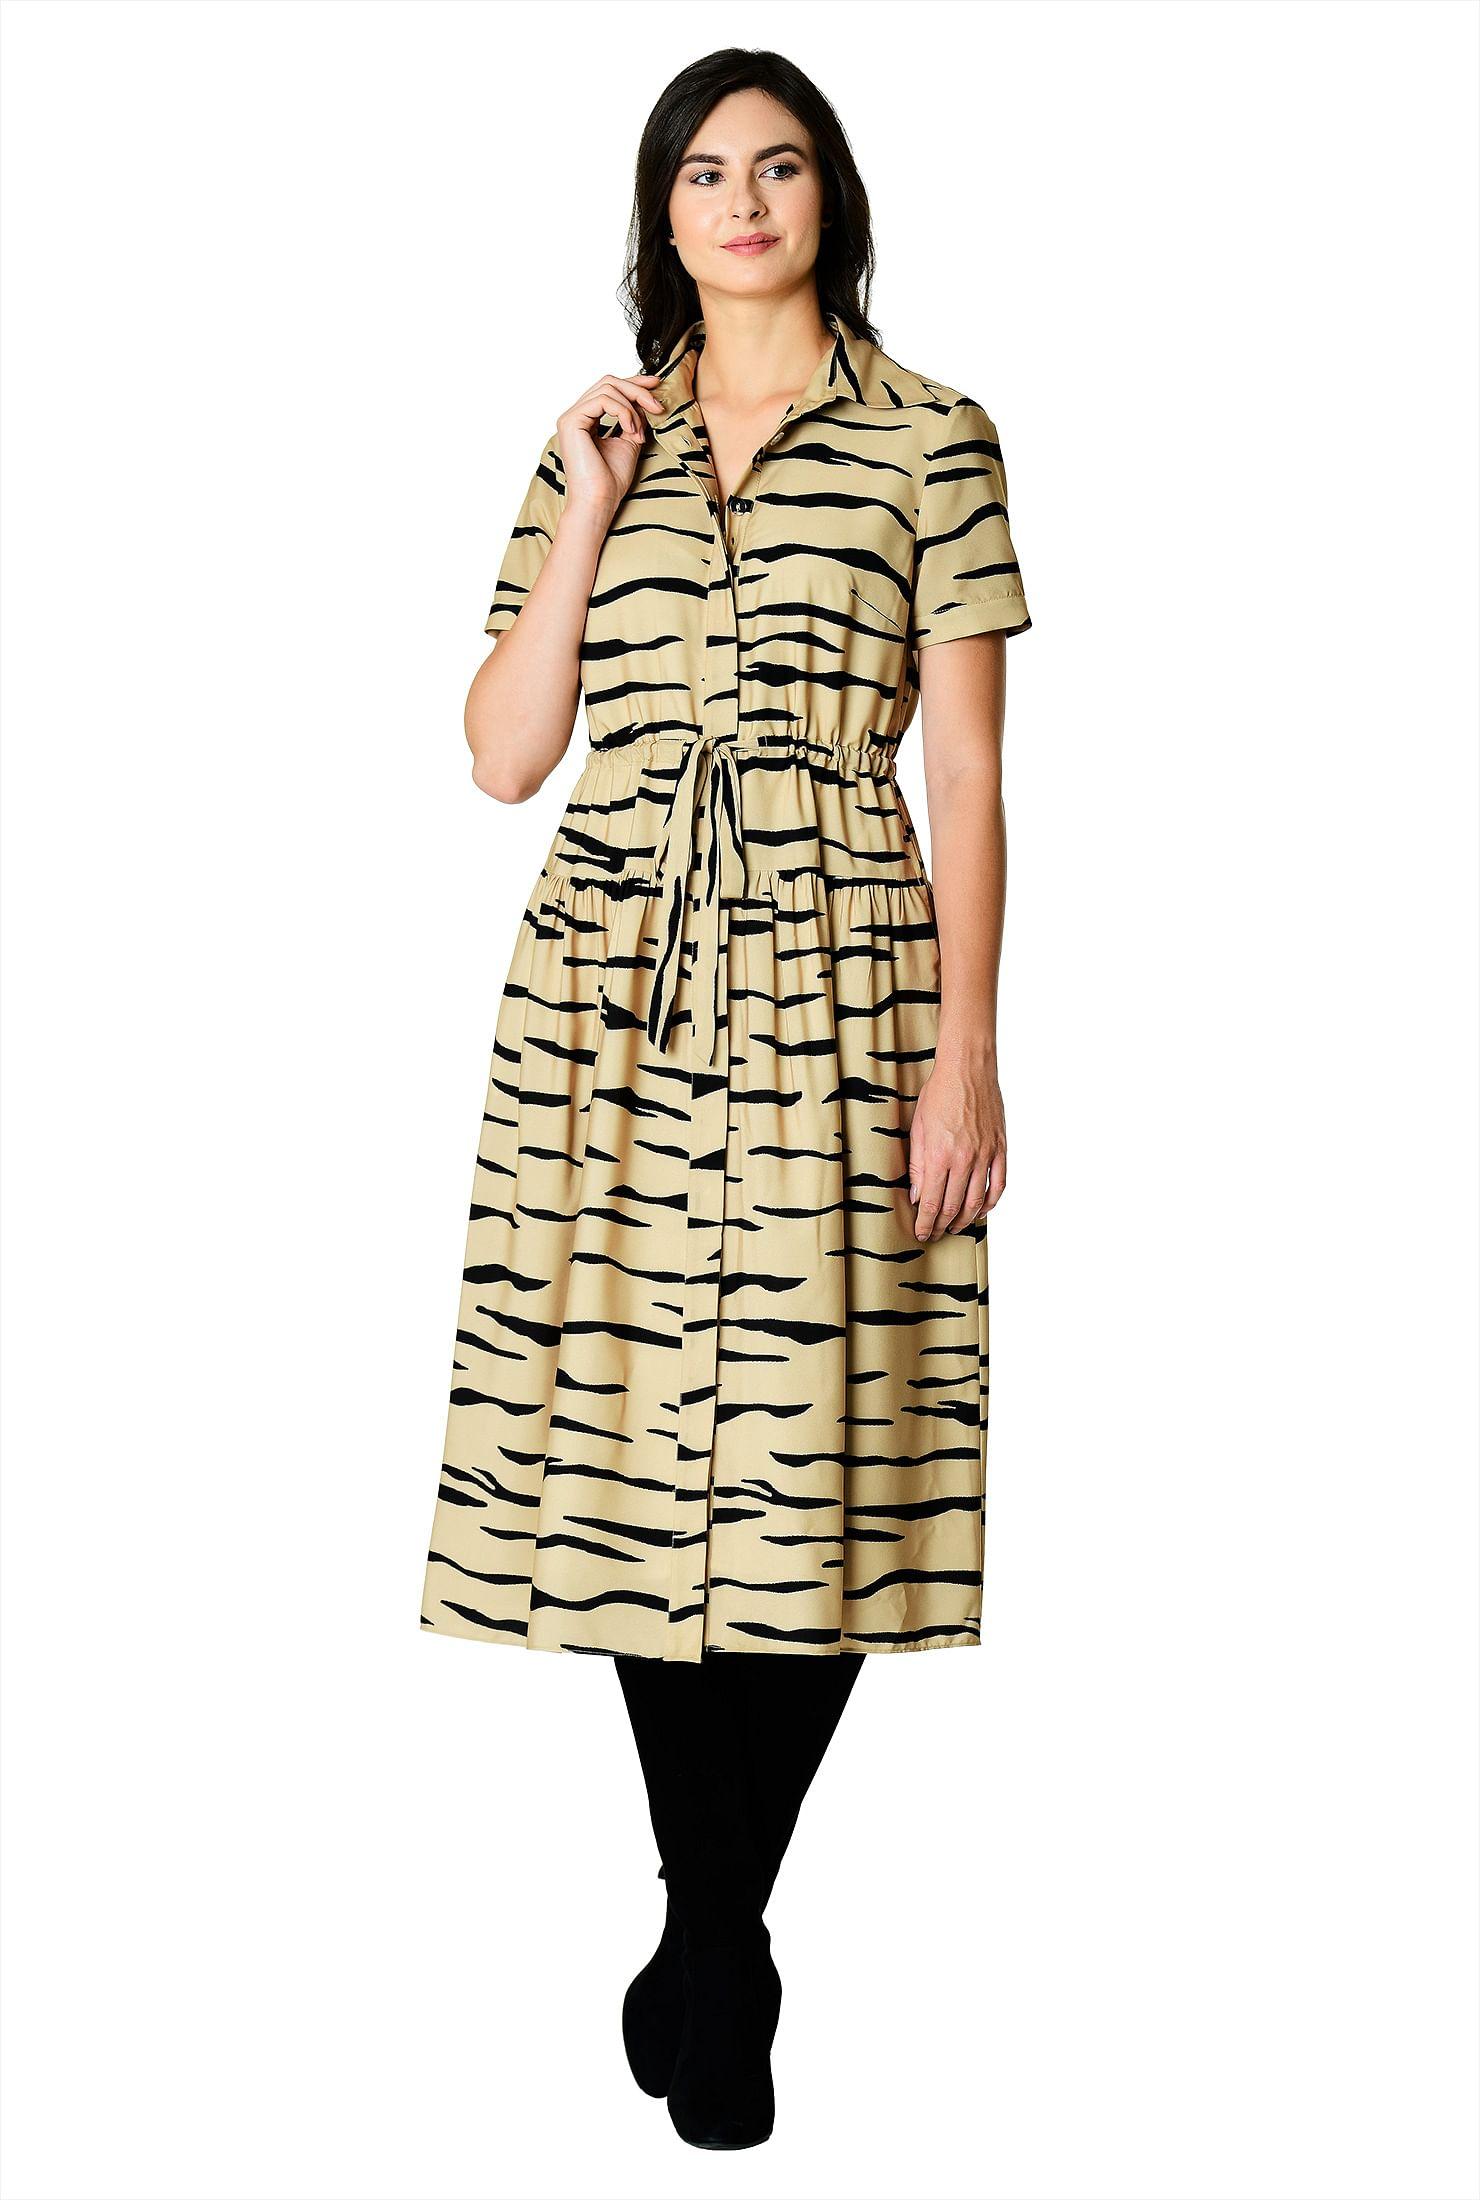 e5a3394fad3c7 beige/black dresses, day dresses, drawstring dresses, Front hidden button  dresses